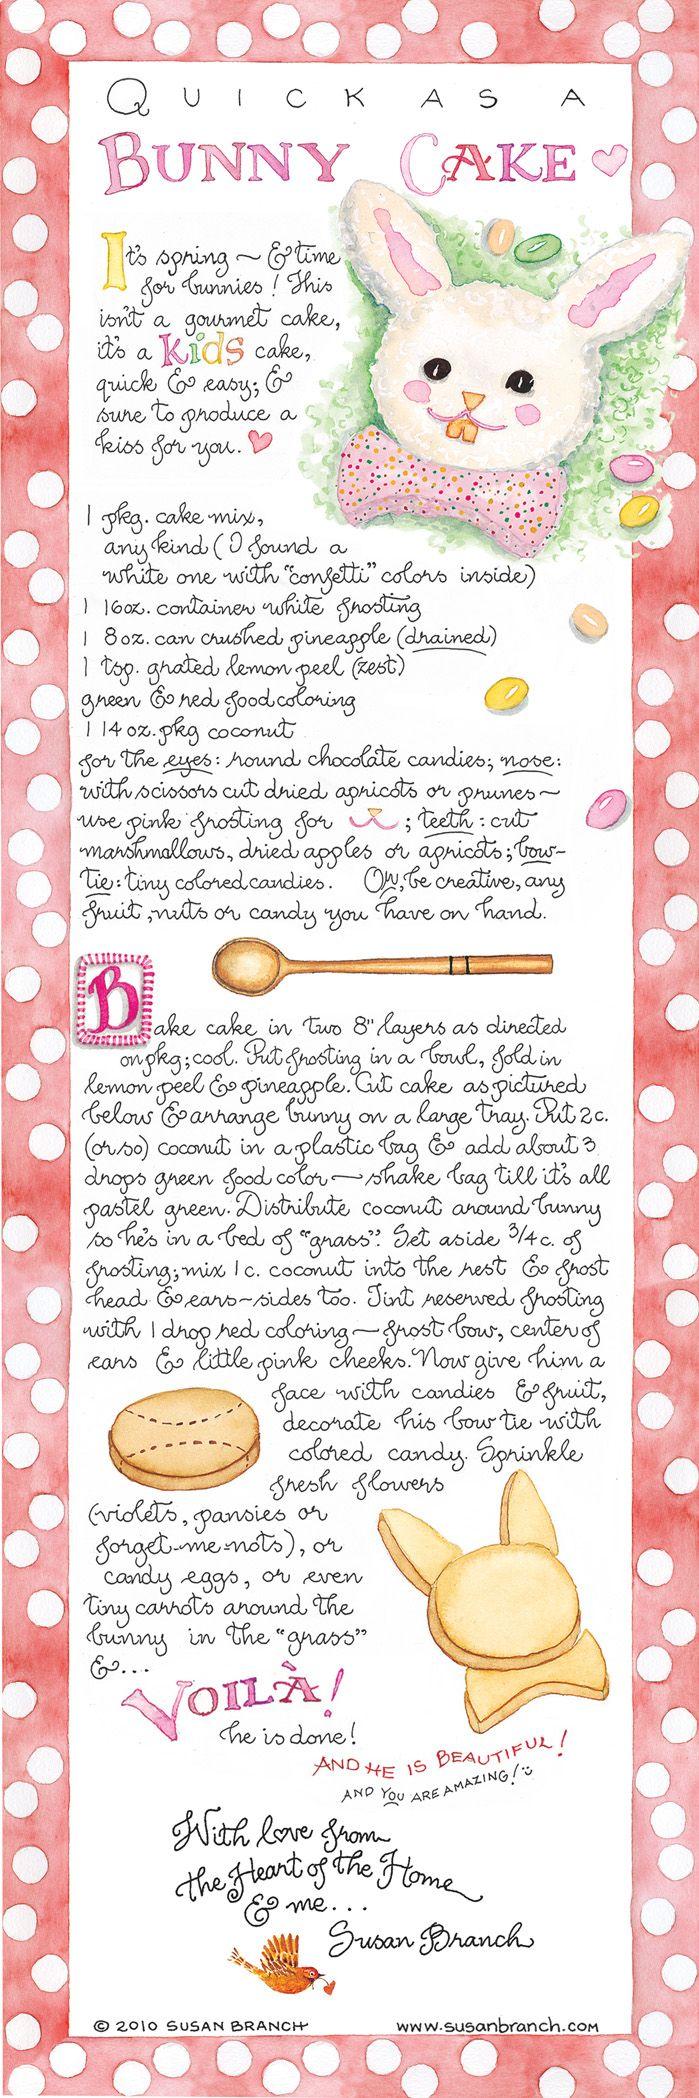 BUNNY CAKE ♥ New Willard Soon! - Susan Branch Blog